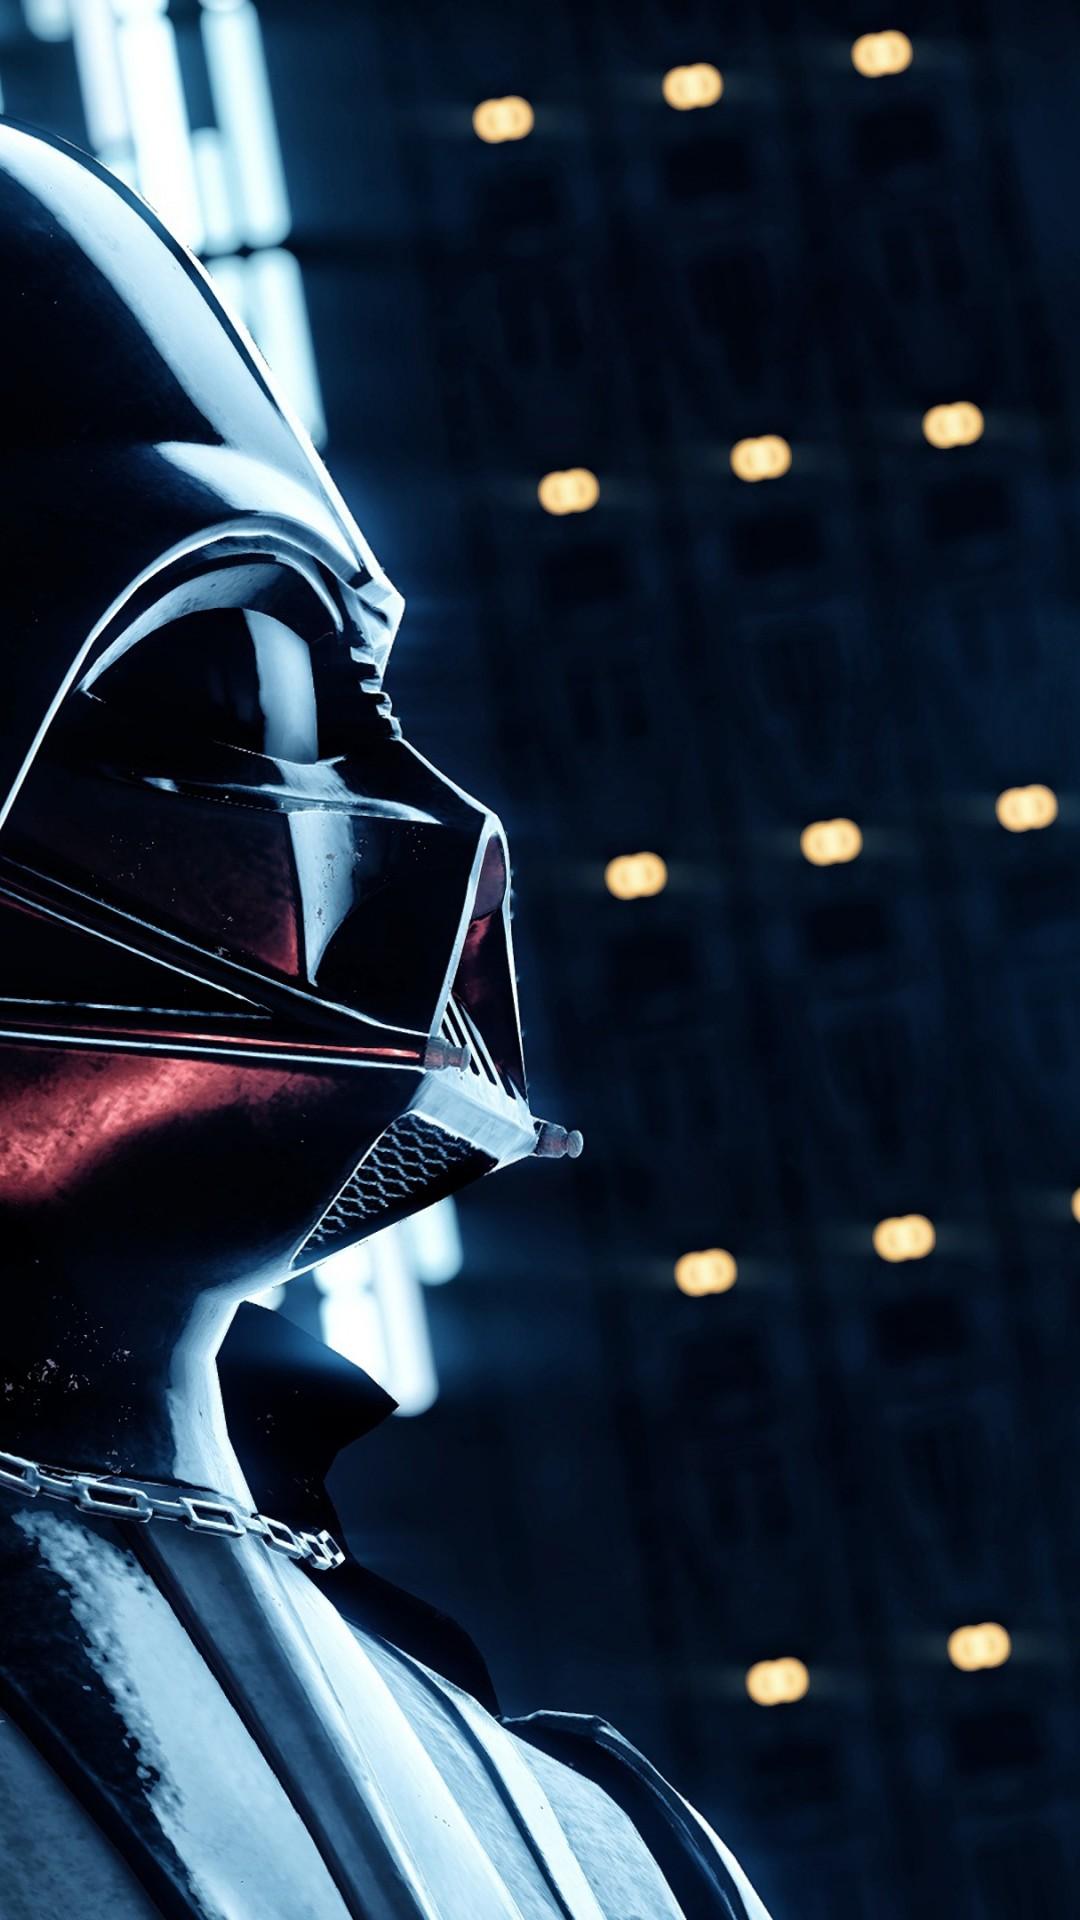 Darth Vader Wallpaper Iphone 1080x1920 Wallpaper Teahub Io